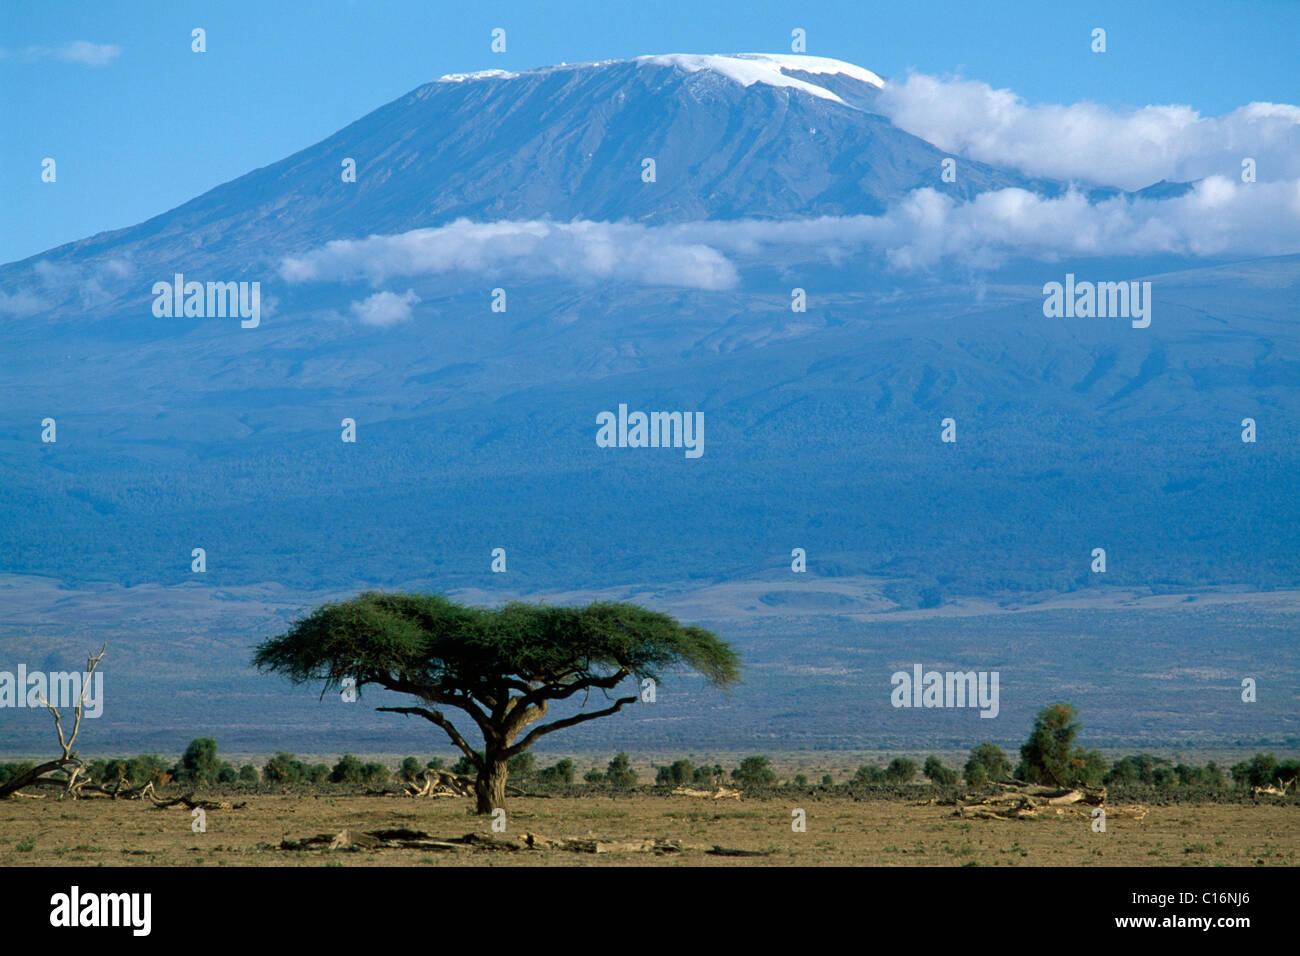 Il Monte Kilimanjaro, Amboseli National Park, Kenya, Africa Immagini Stock